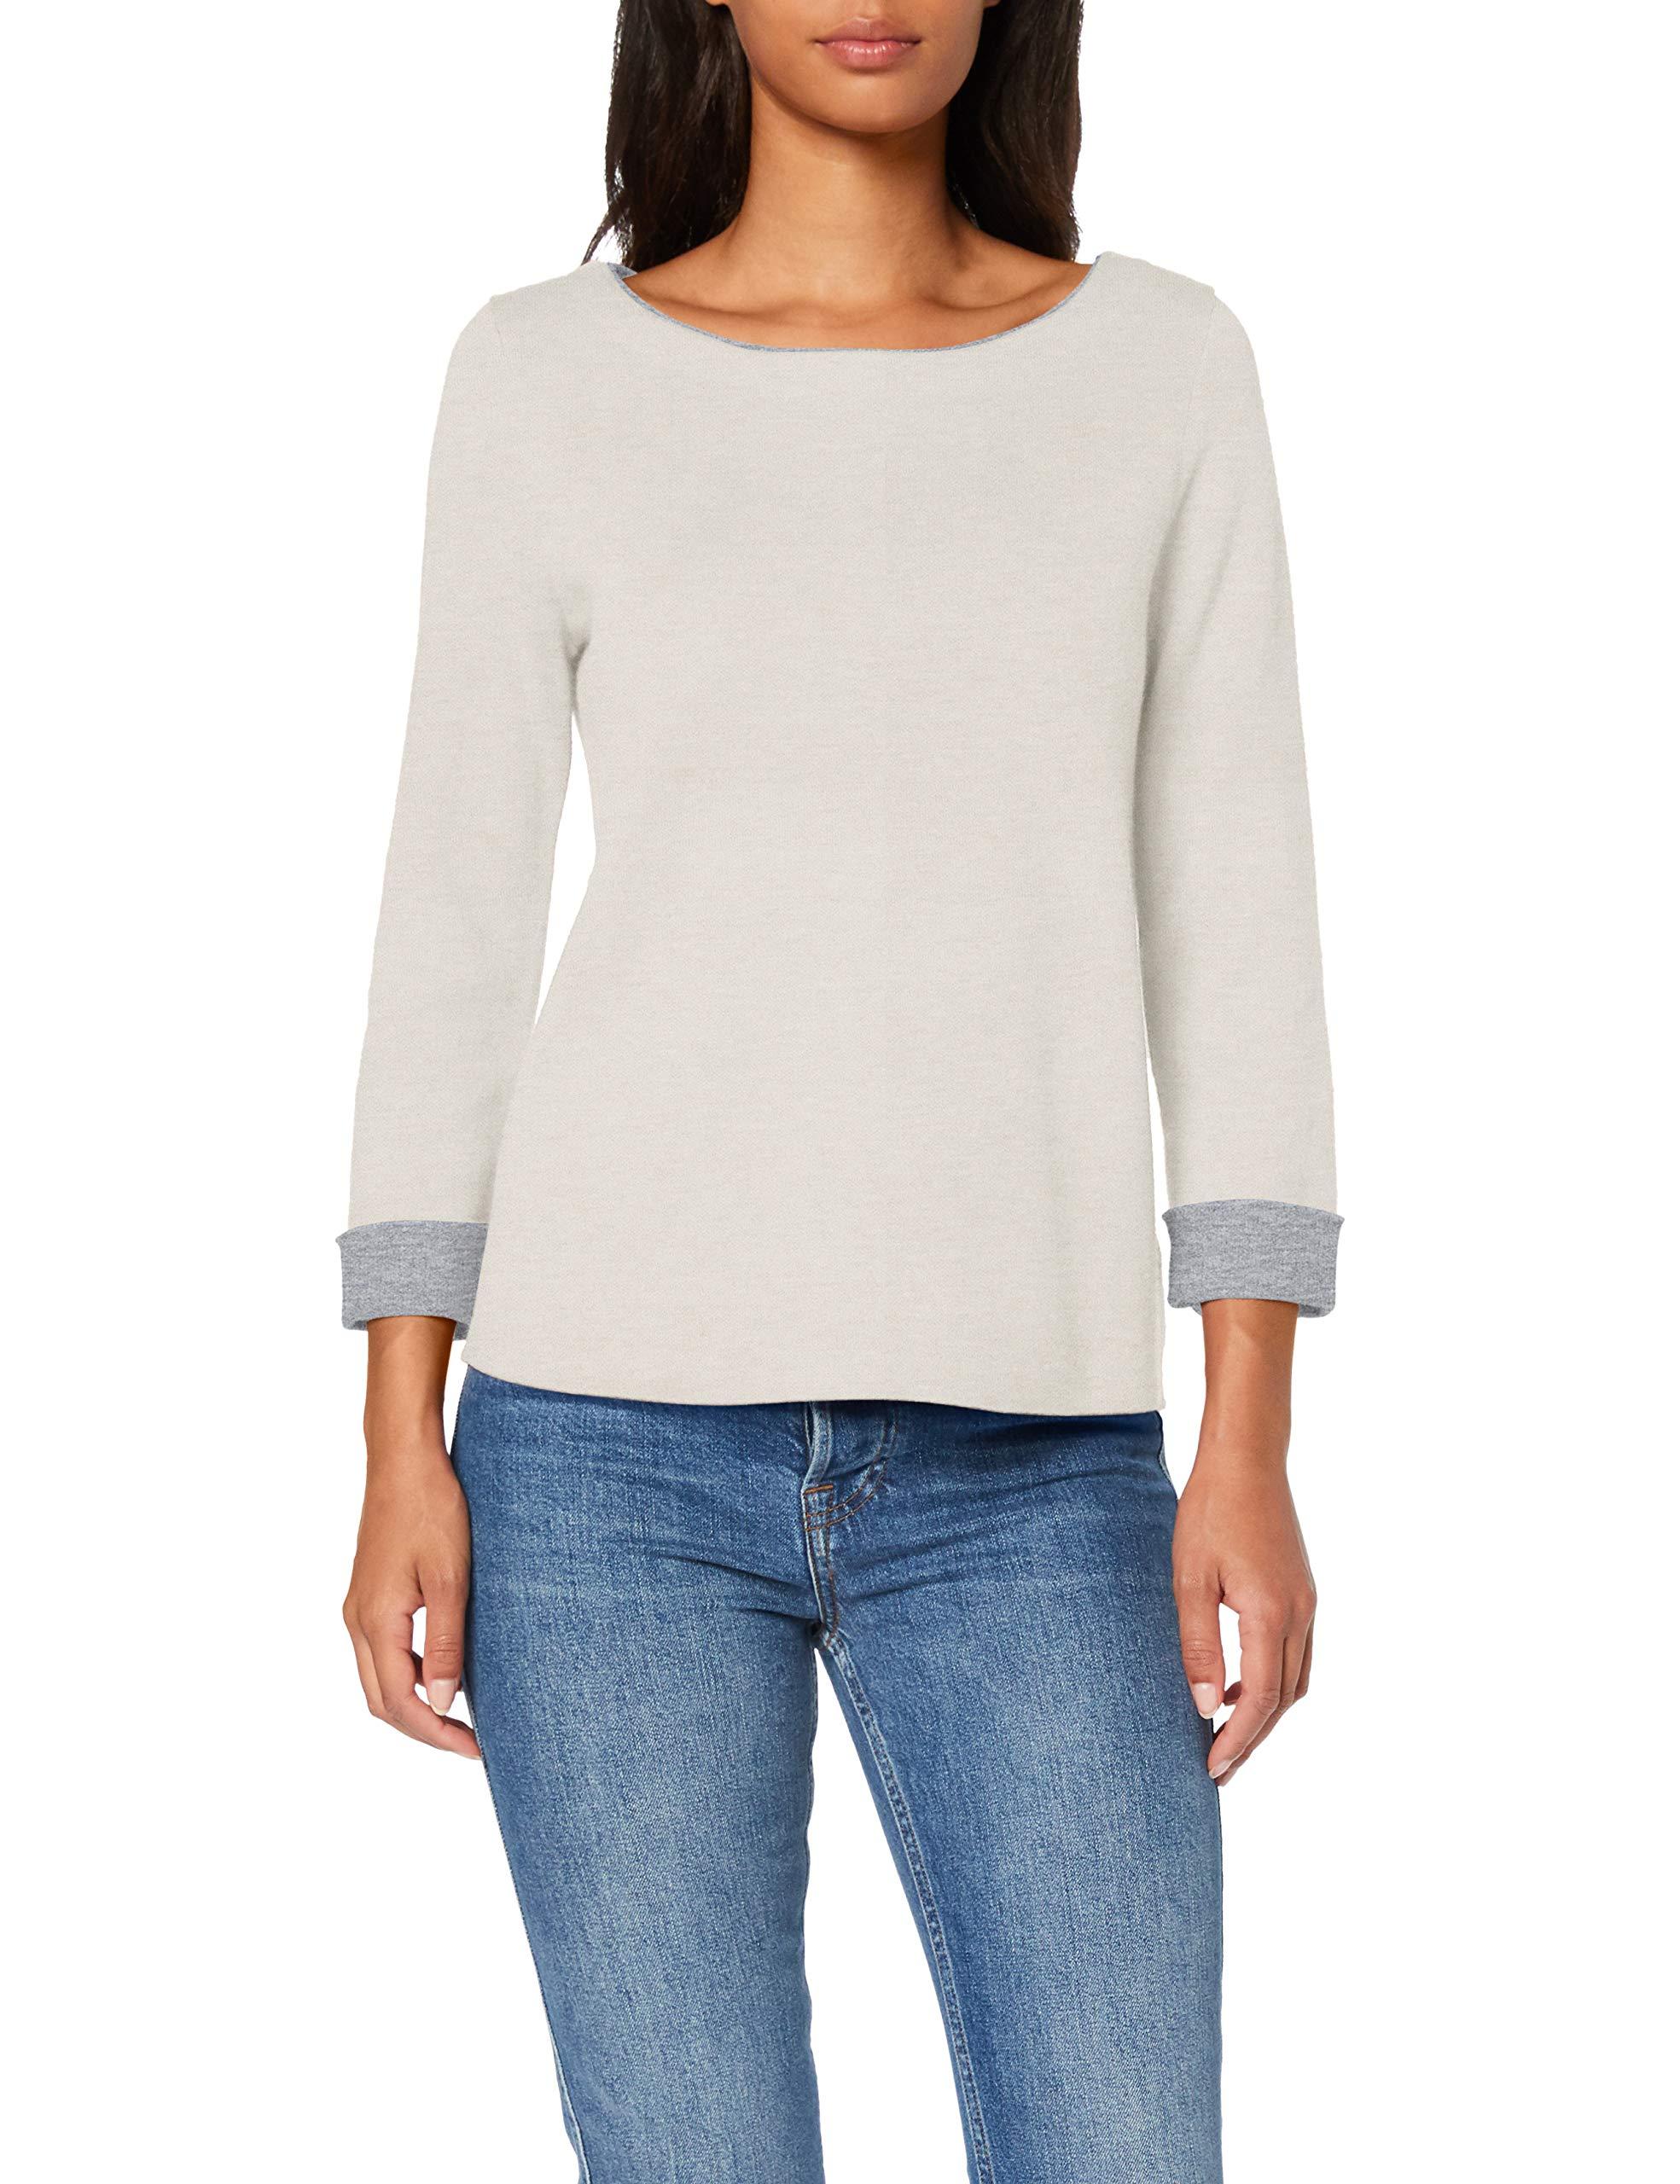 Sisley Damen Pullover LS, Grau (Grey Melange 901), Small